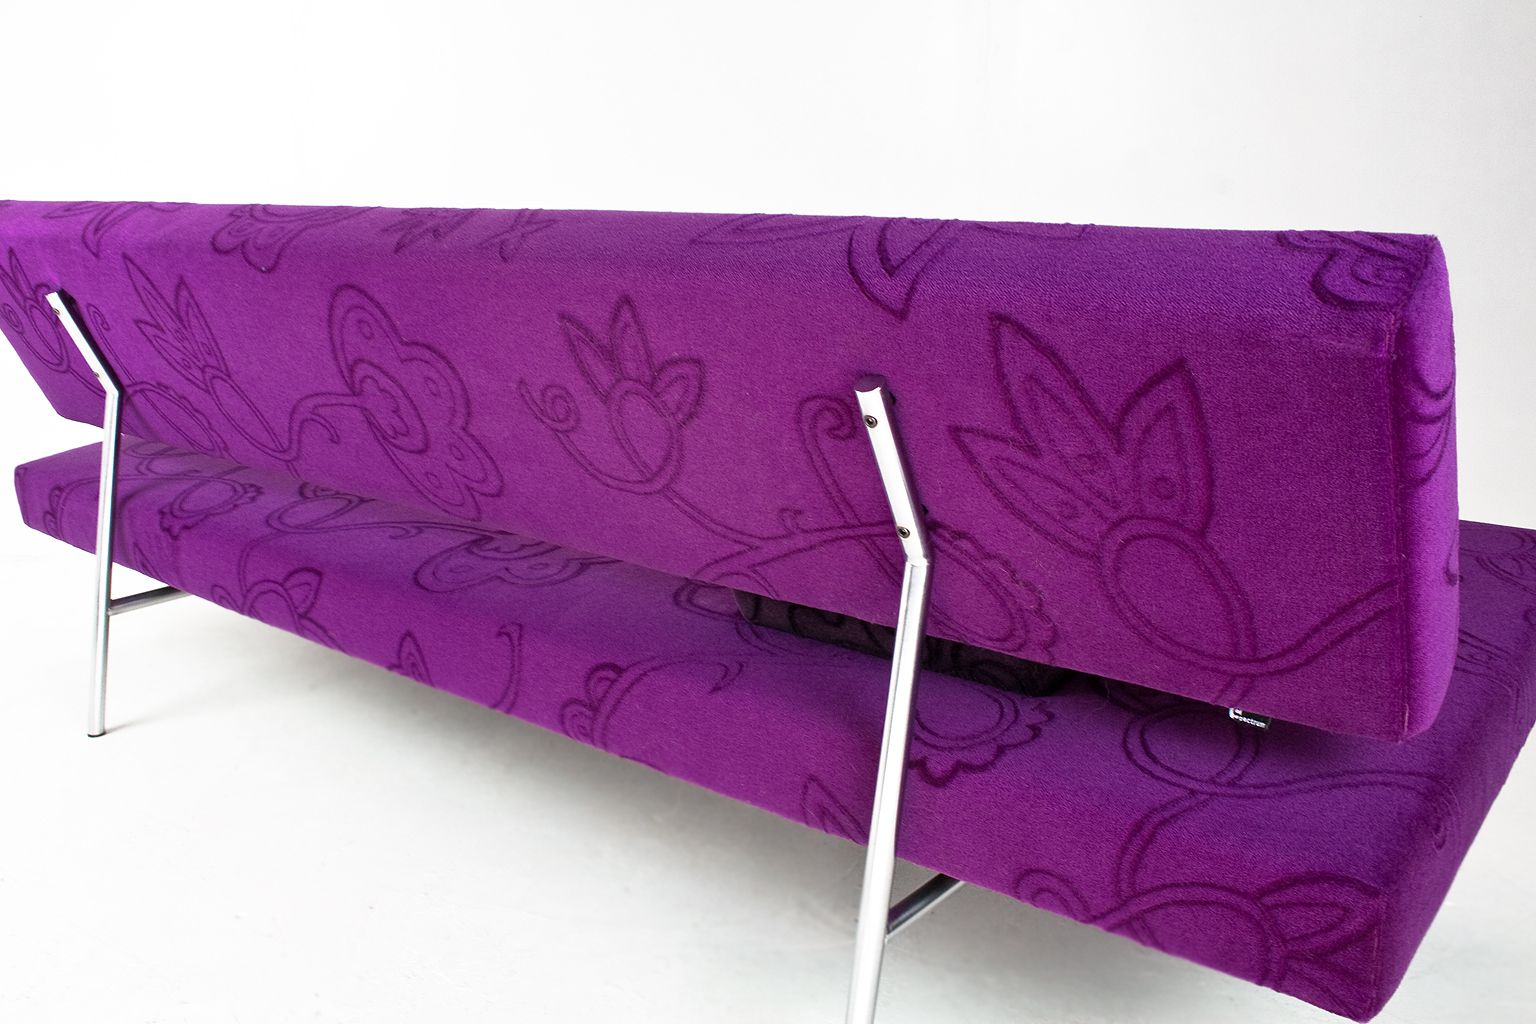 br02 schlafsofa aus lila samt von martin visser f r 39 t. Black Bedroom Furniture Sets. Home Design Ideas